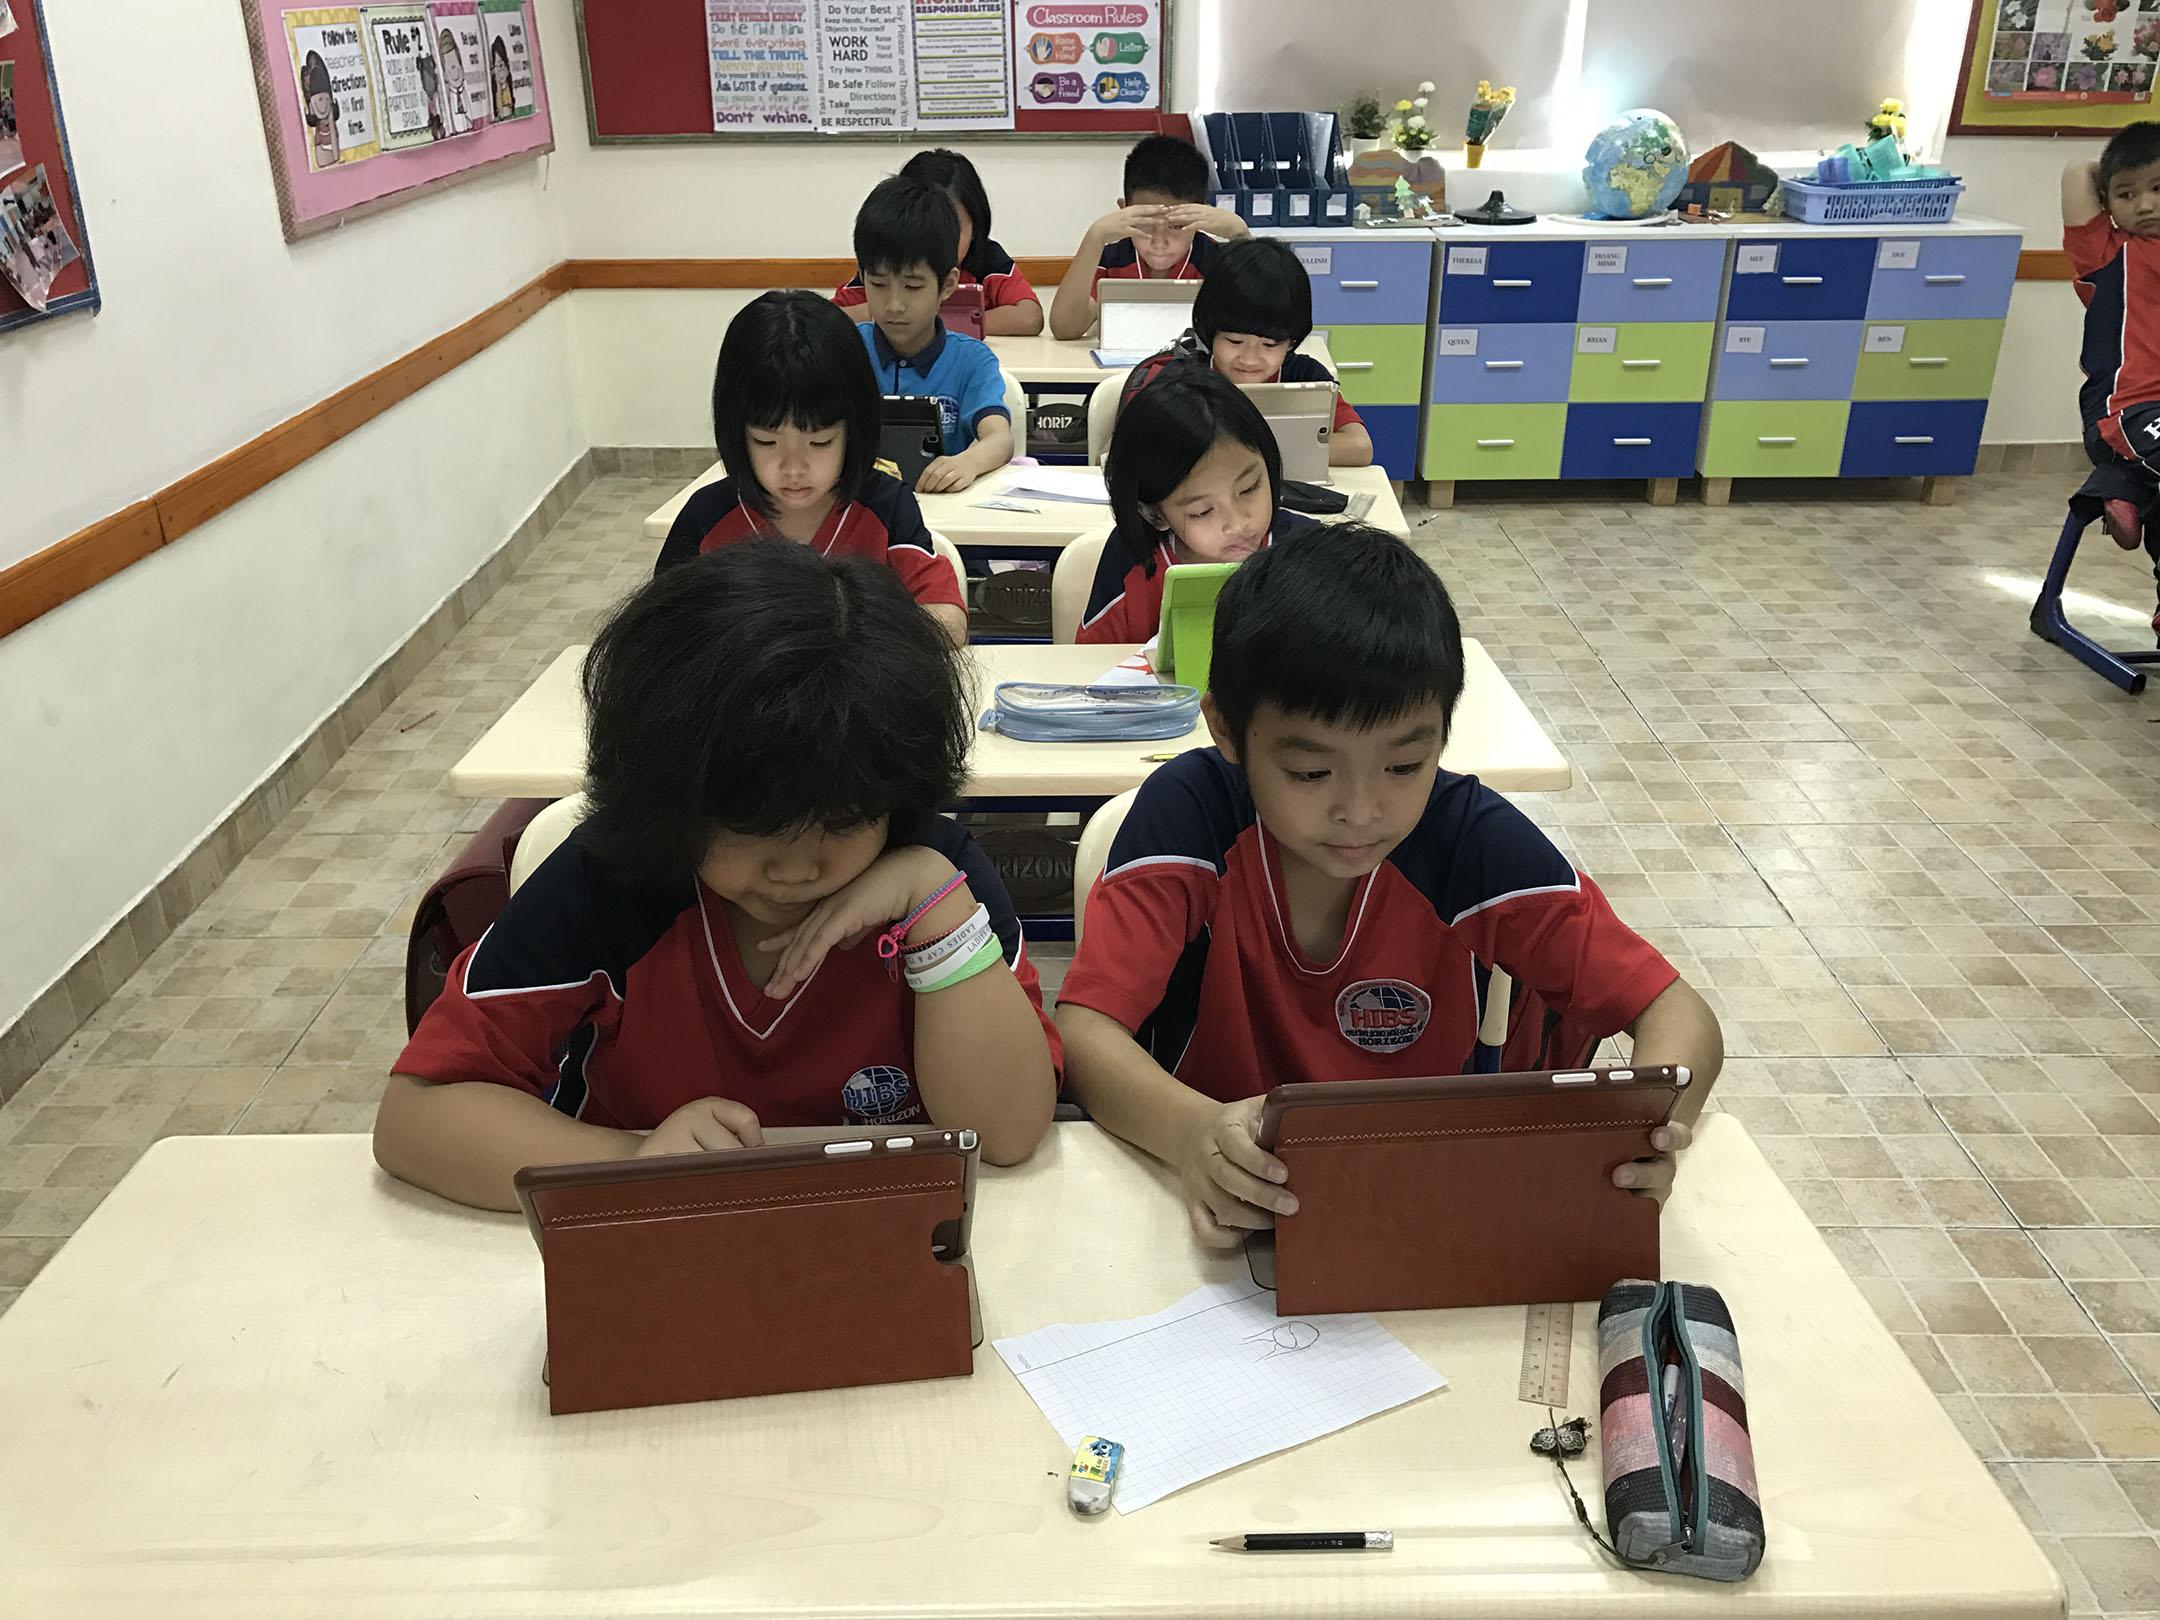 Fancy Ixl For School Photo - Math Exercises - obgscuola.info